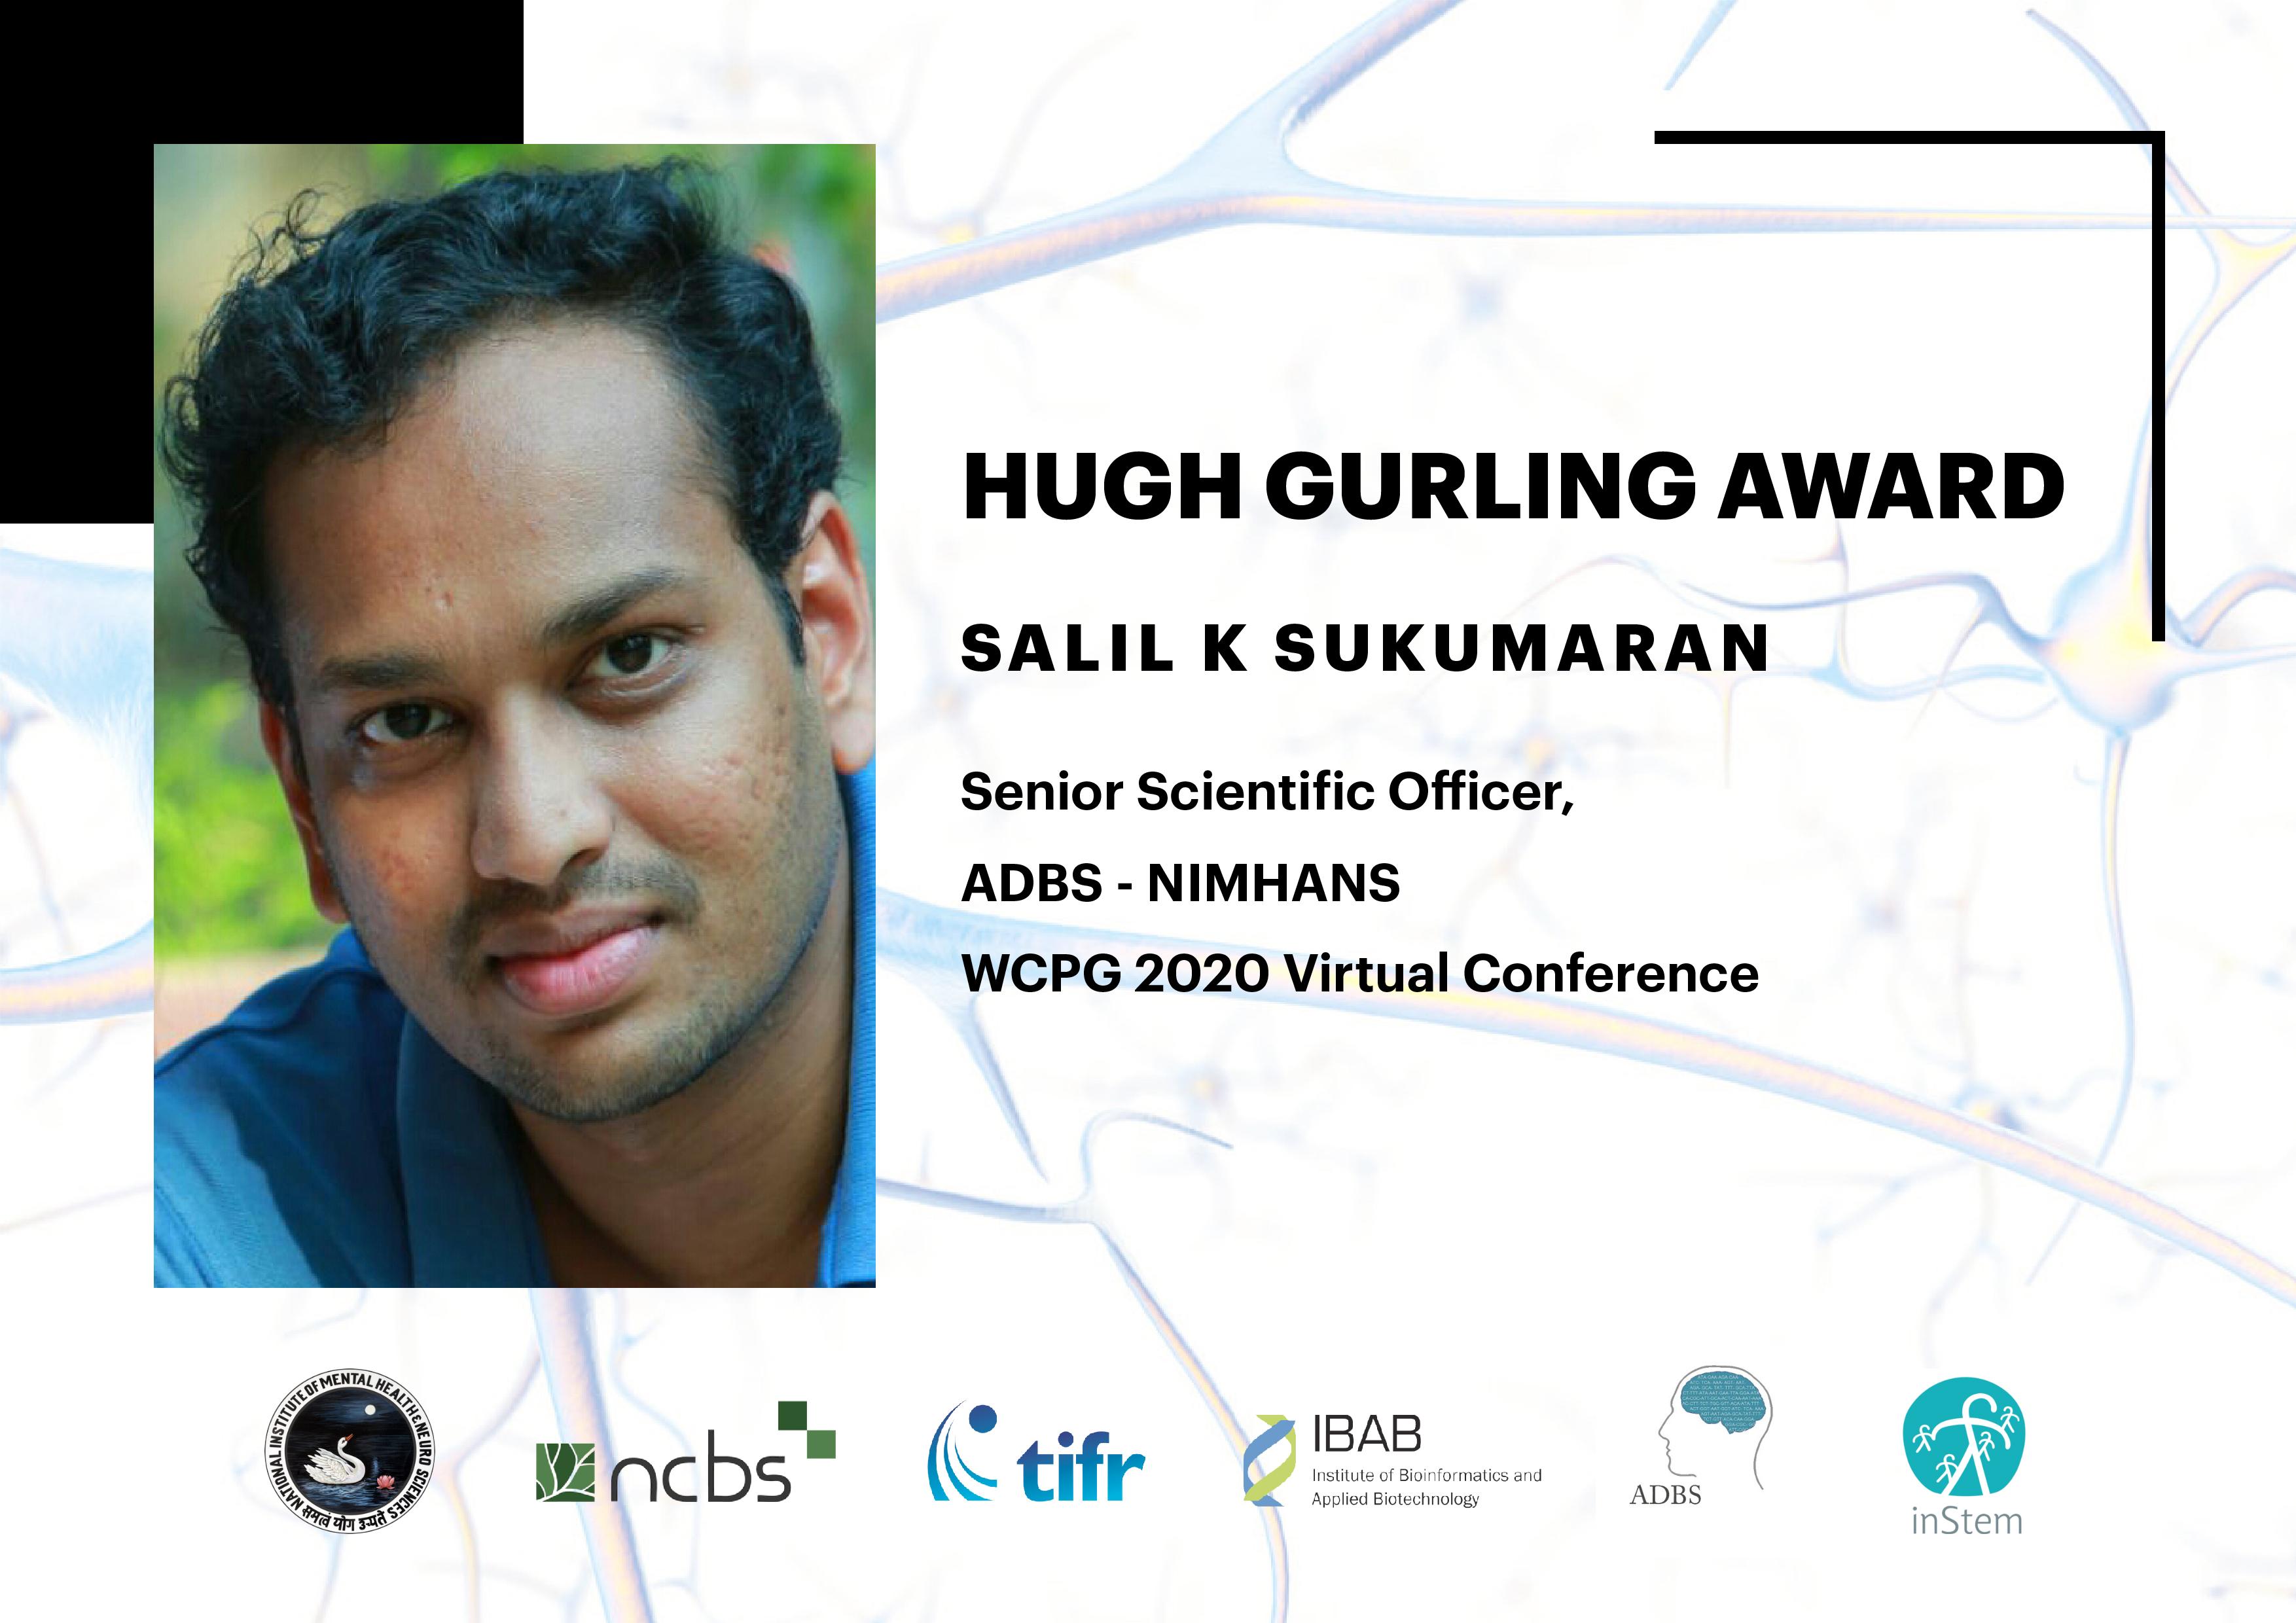 Dr. Salil Sukumaran of ADBS Program Receives the Prestigious Hugh Gurling Award in World Congress of Psychiatric Genetics (WCPG), 2020